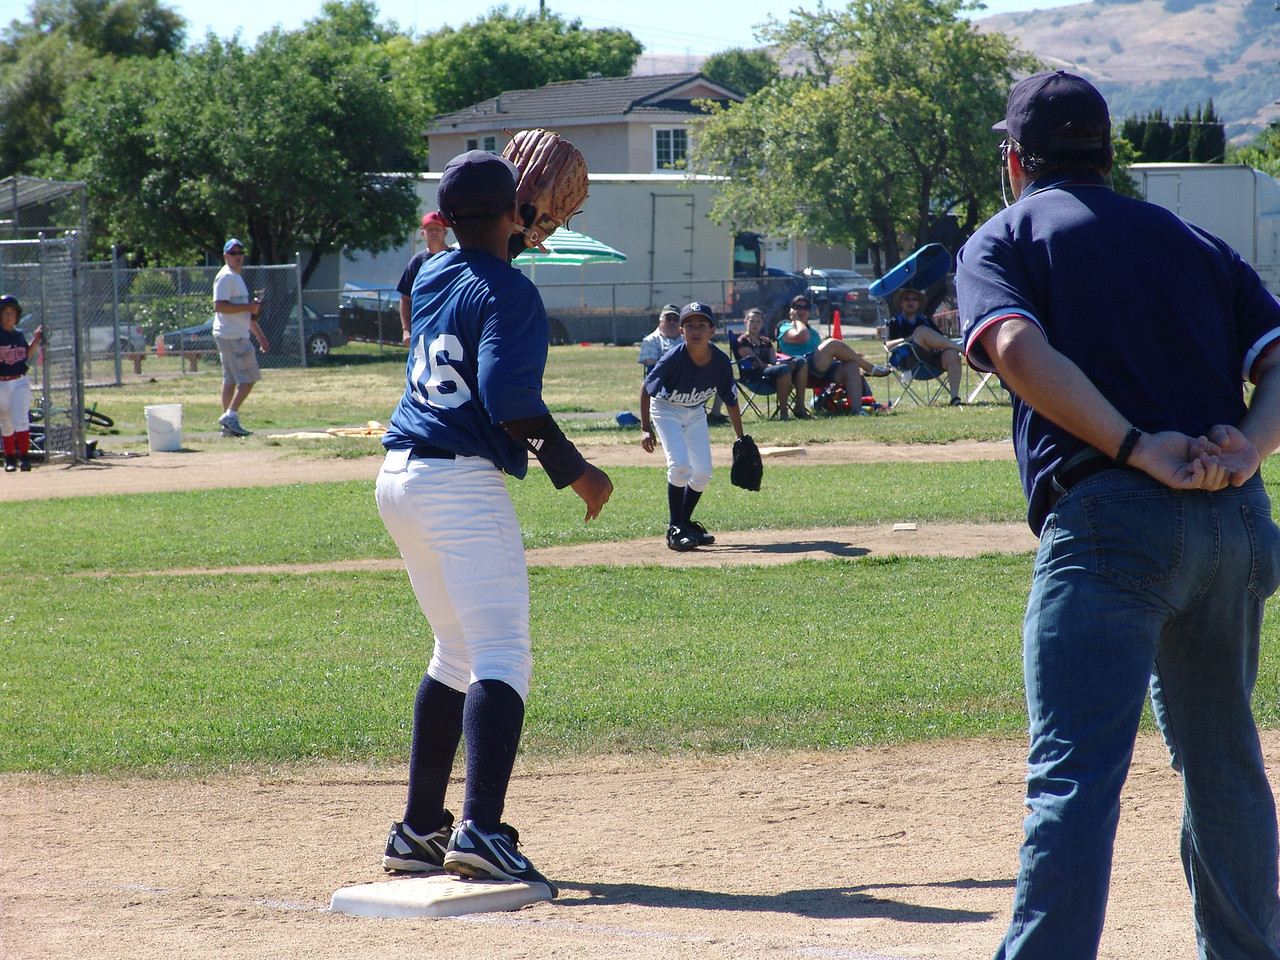 Yankees vs Twins TrnRnd2 (5)